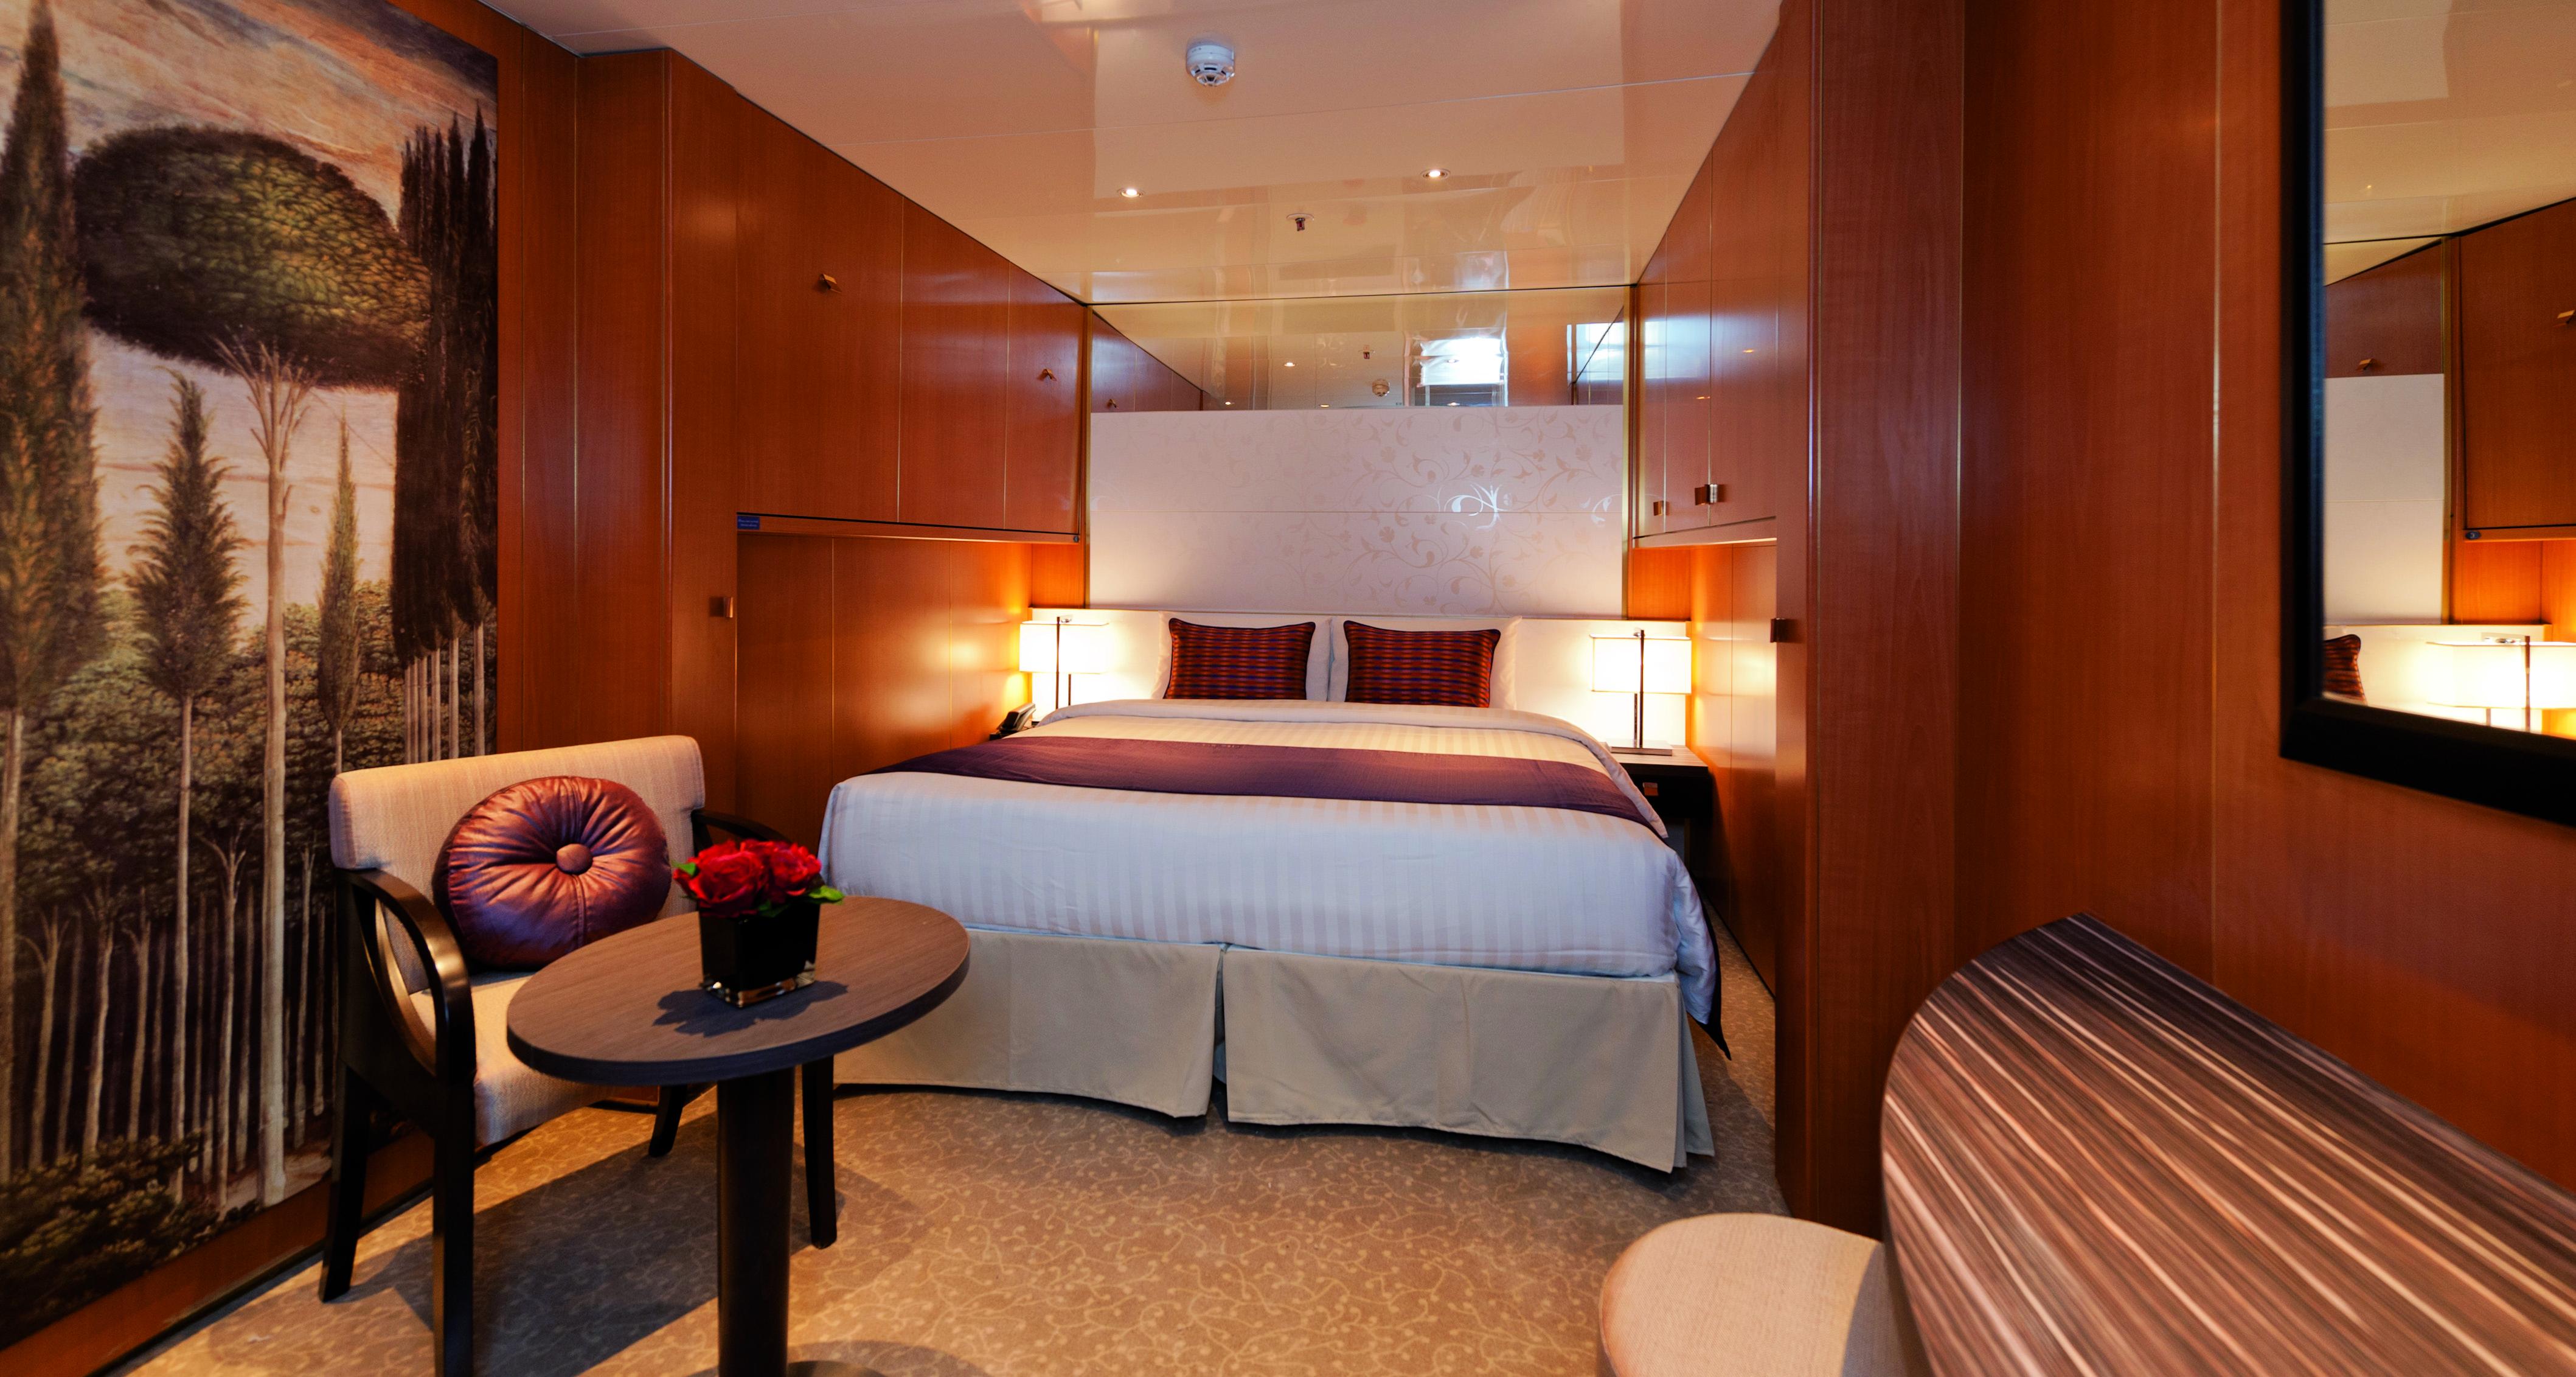 Costa Cruises Costa neoRomantica Accommodation Inside Cabin.jpg